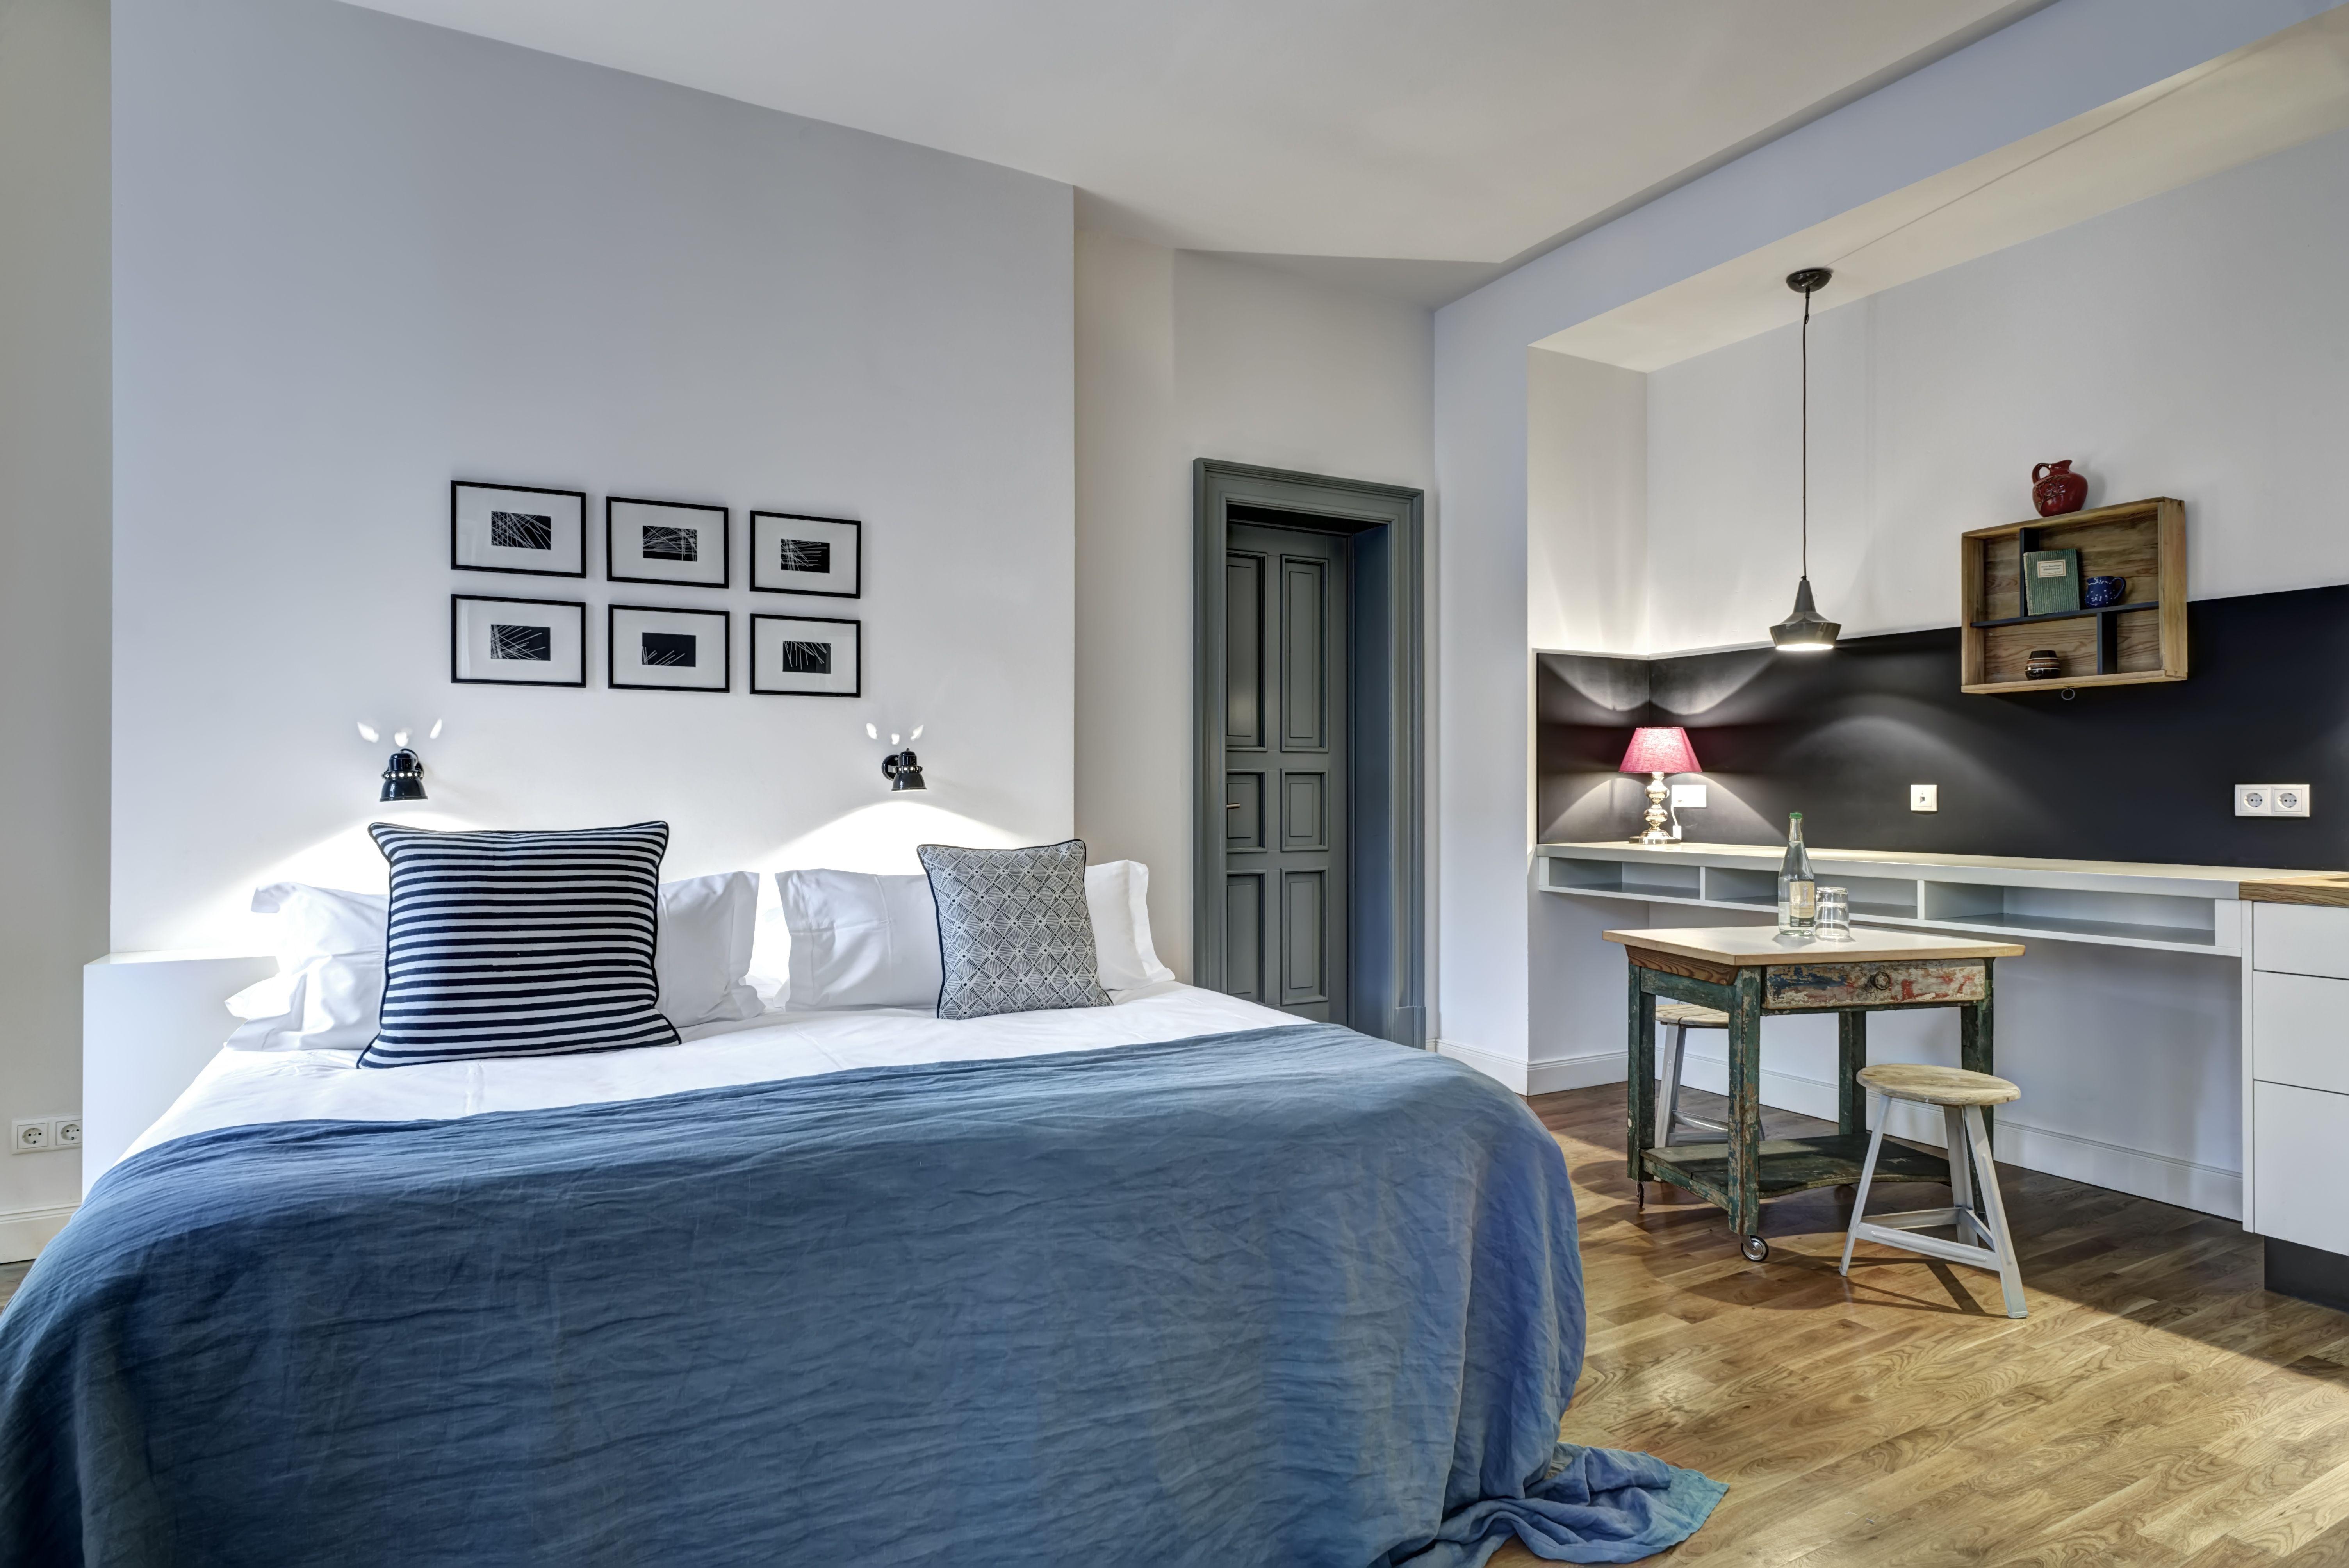 Gorki Apartments Berlin categorki 2a at the gorki apartments in berlin designed by